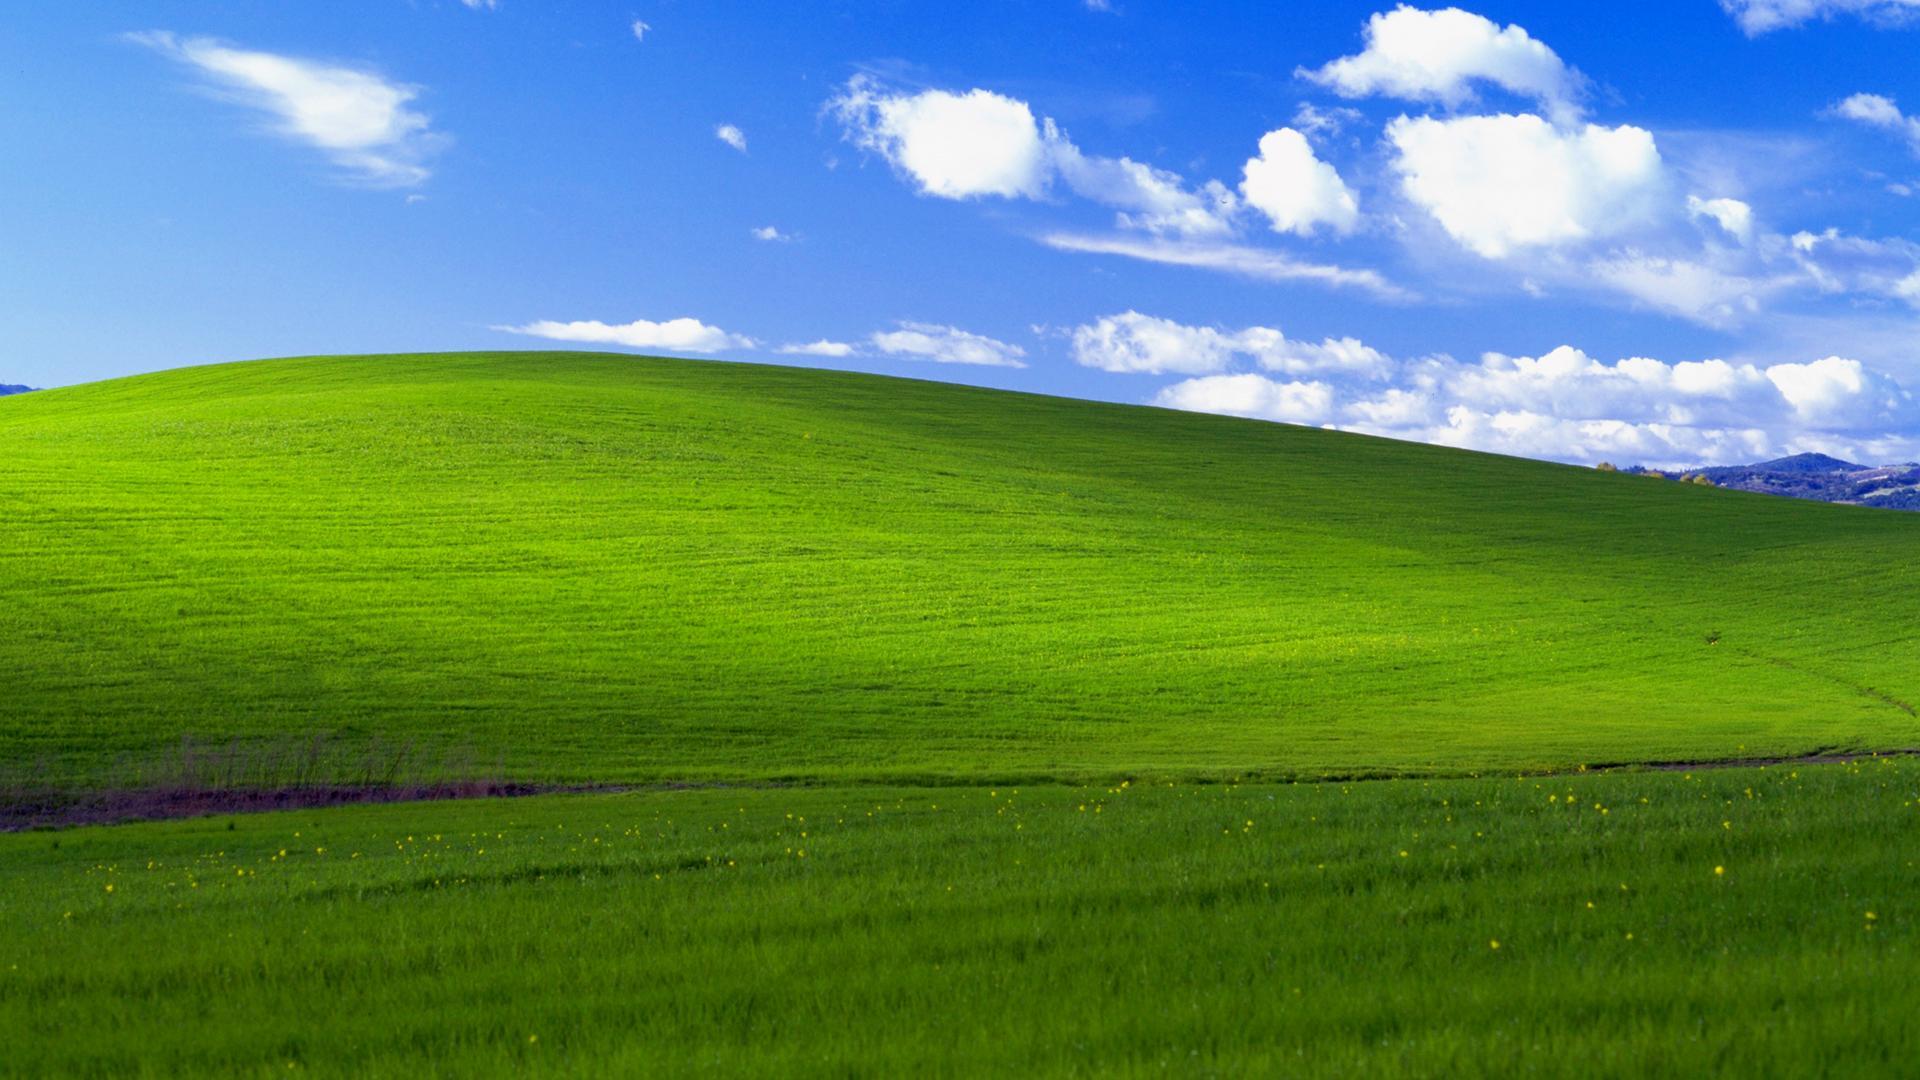 Default Windows Wallpaper